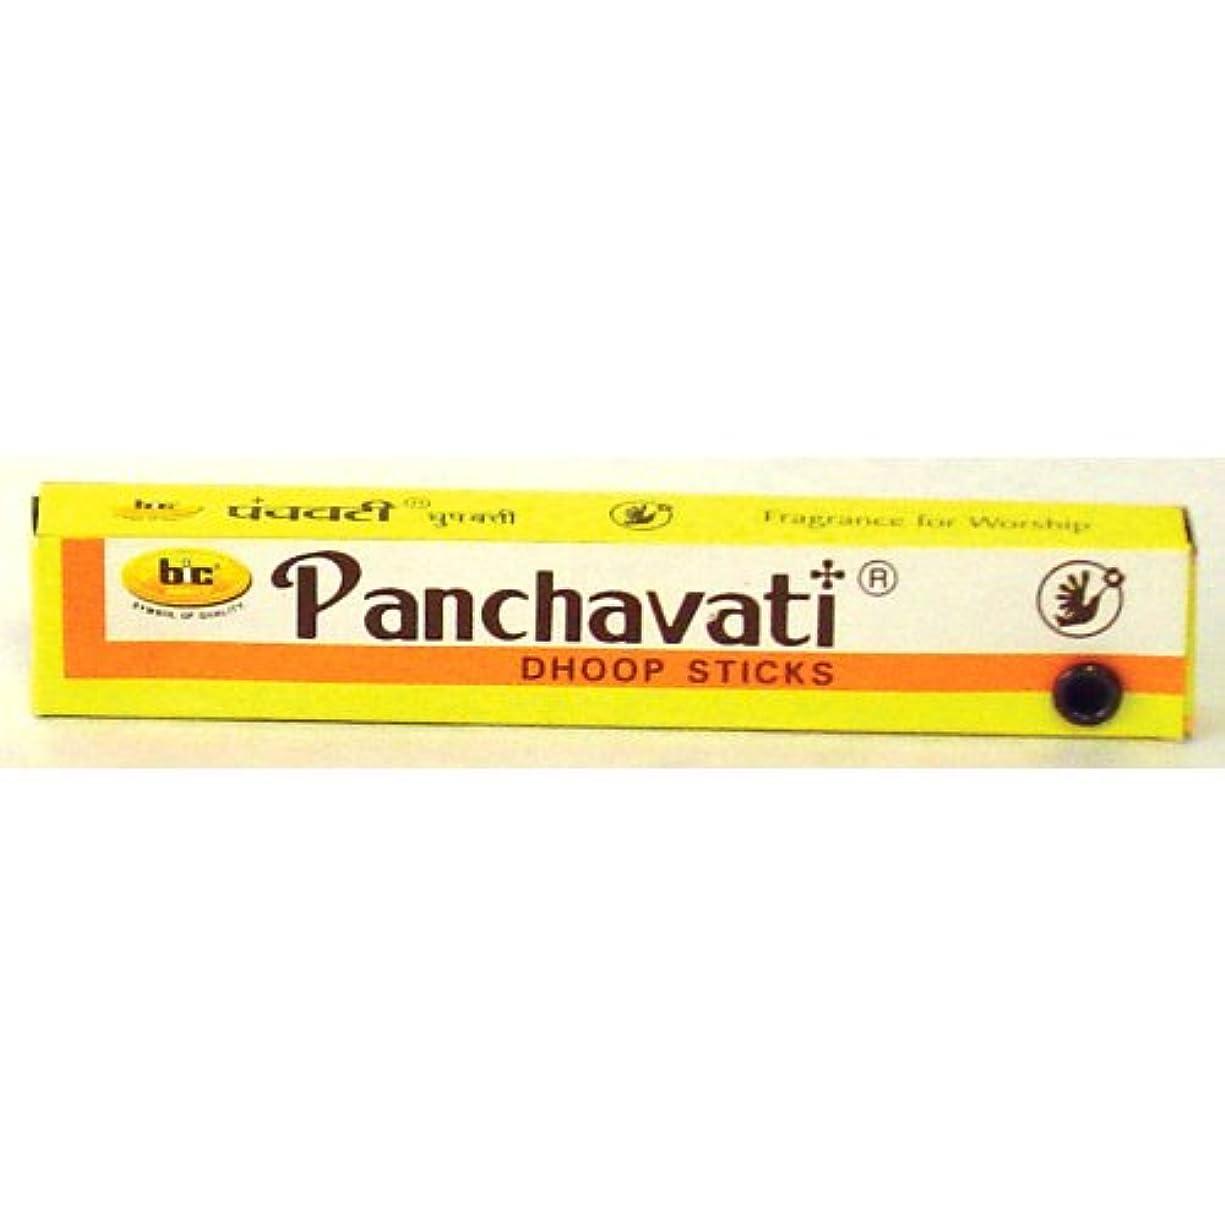 Panchavati Dhoop Sticks - One Dozen Boxes - 5 King Size by Incense